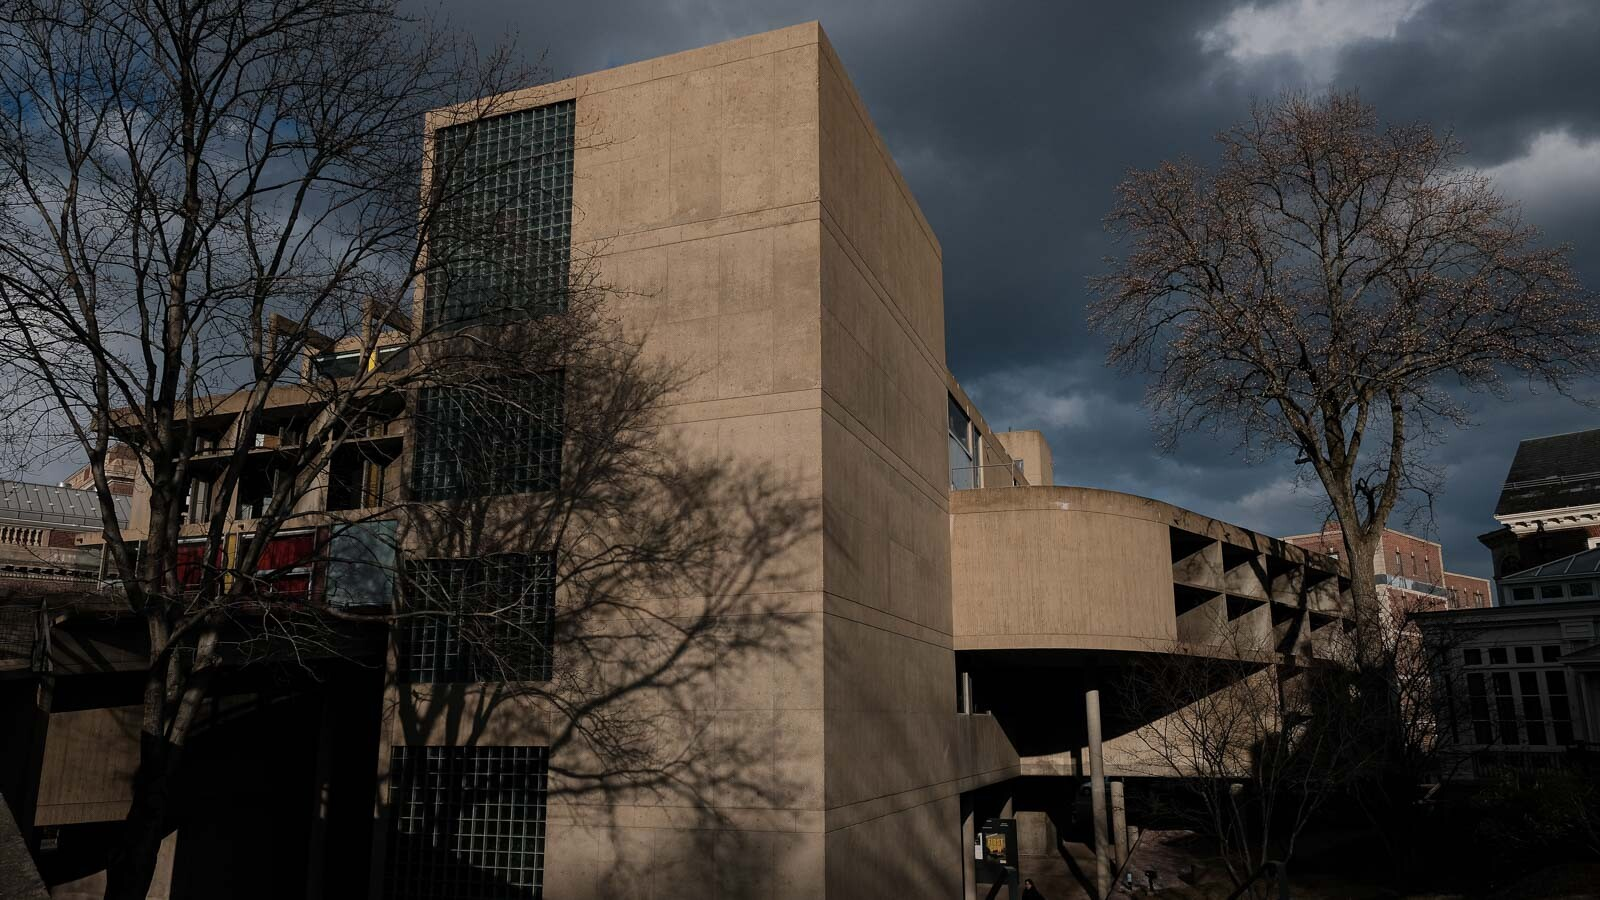 Carpenter Center for the Visual Arts